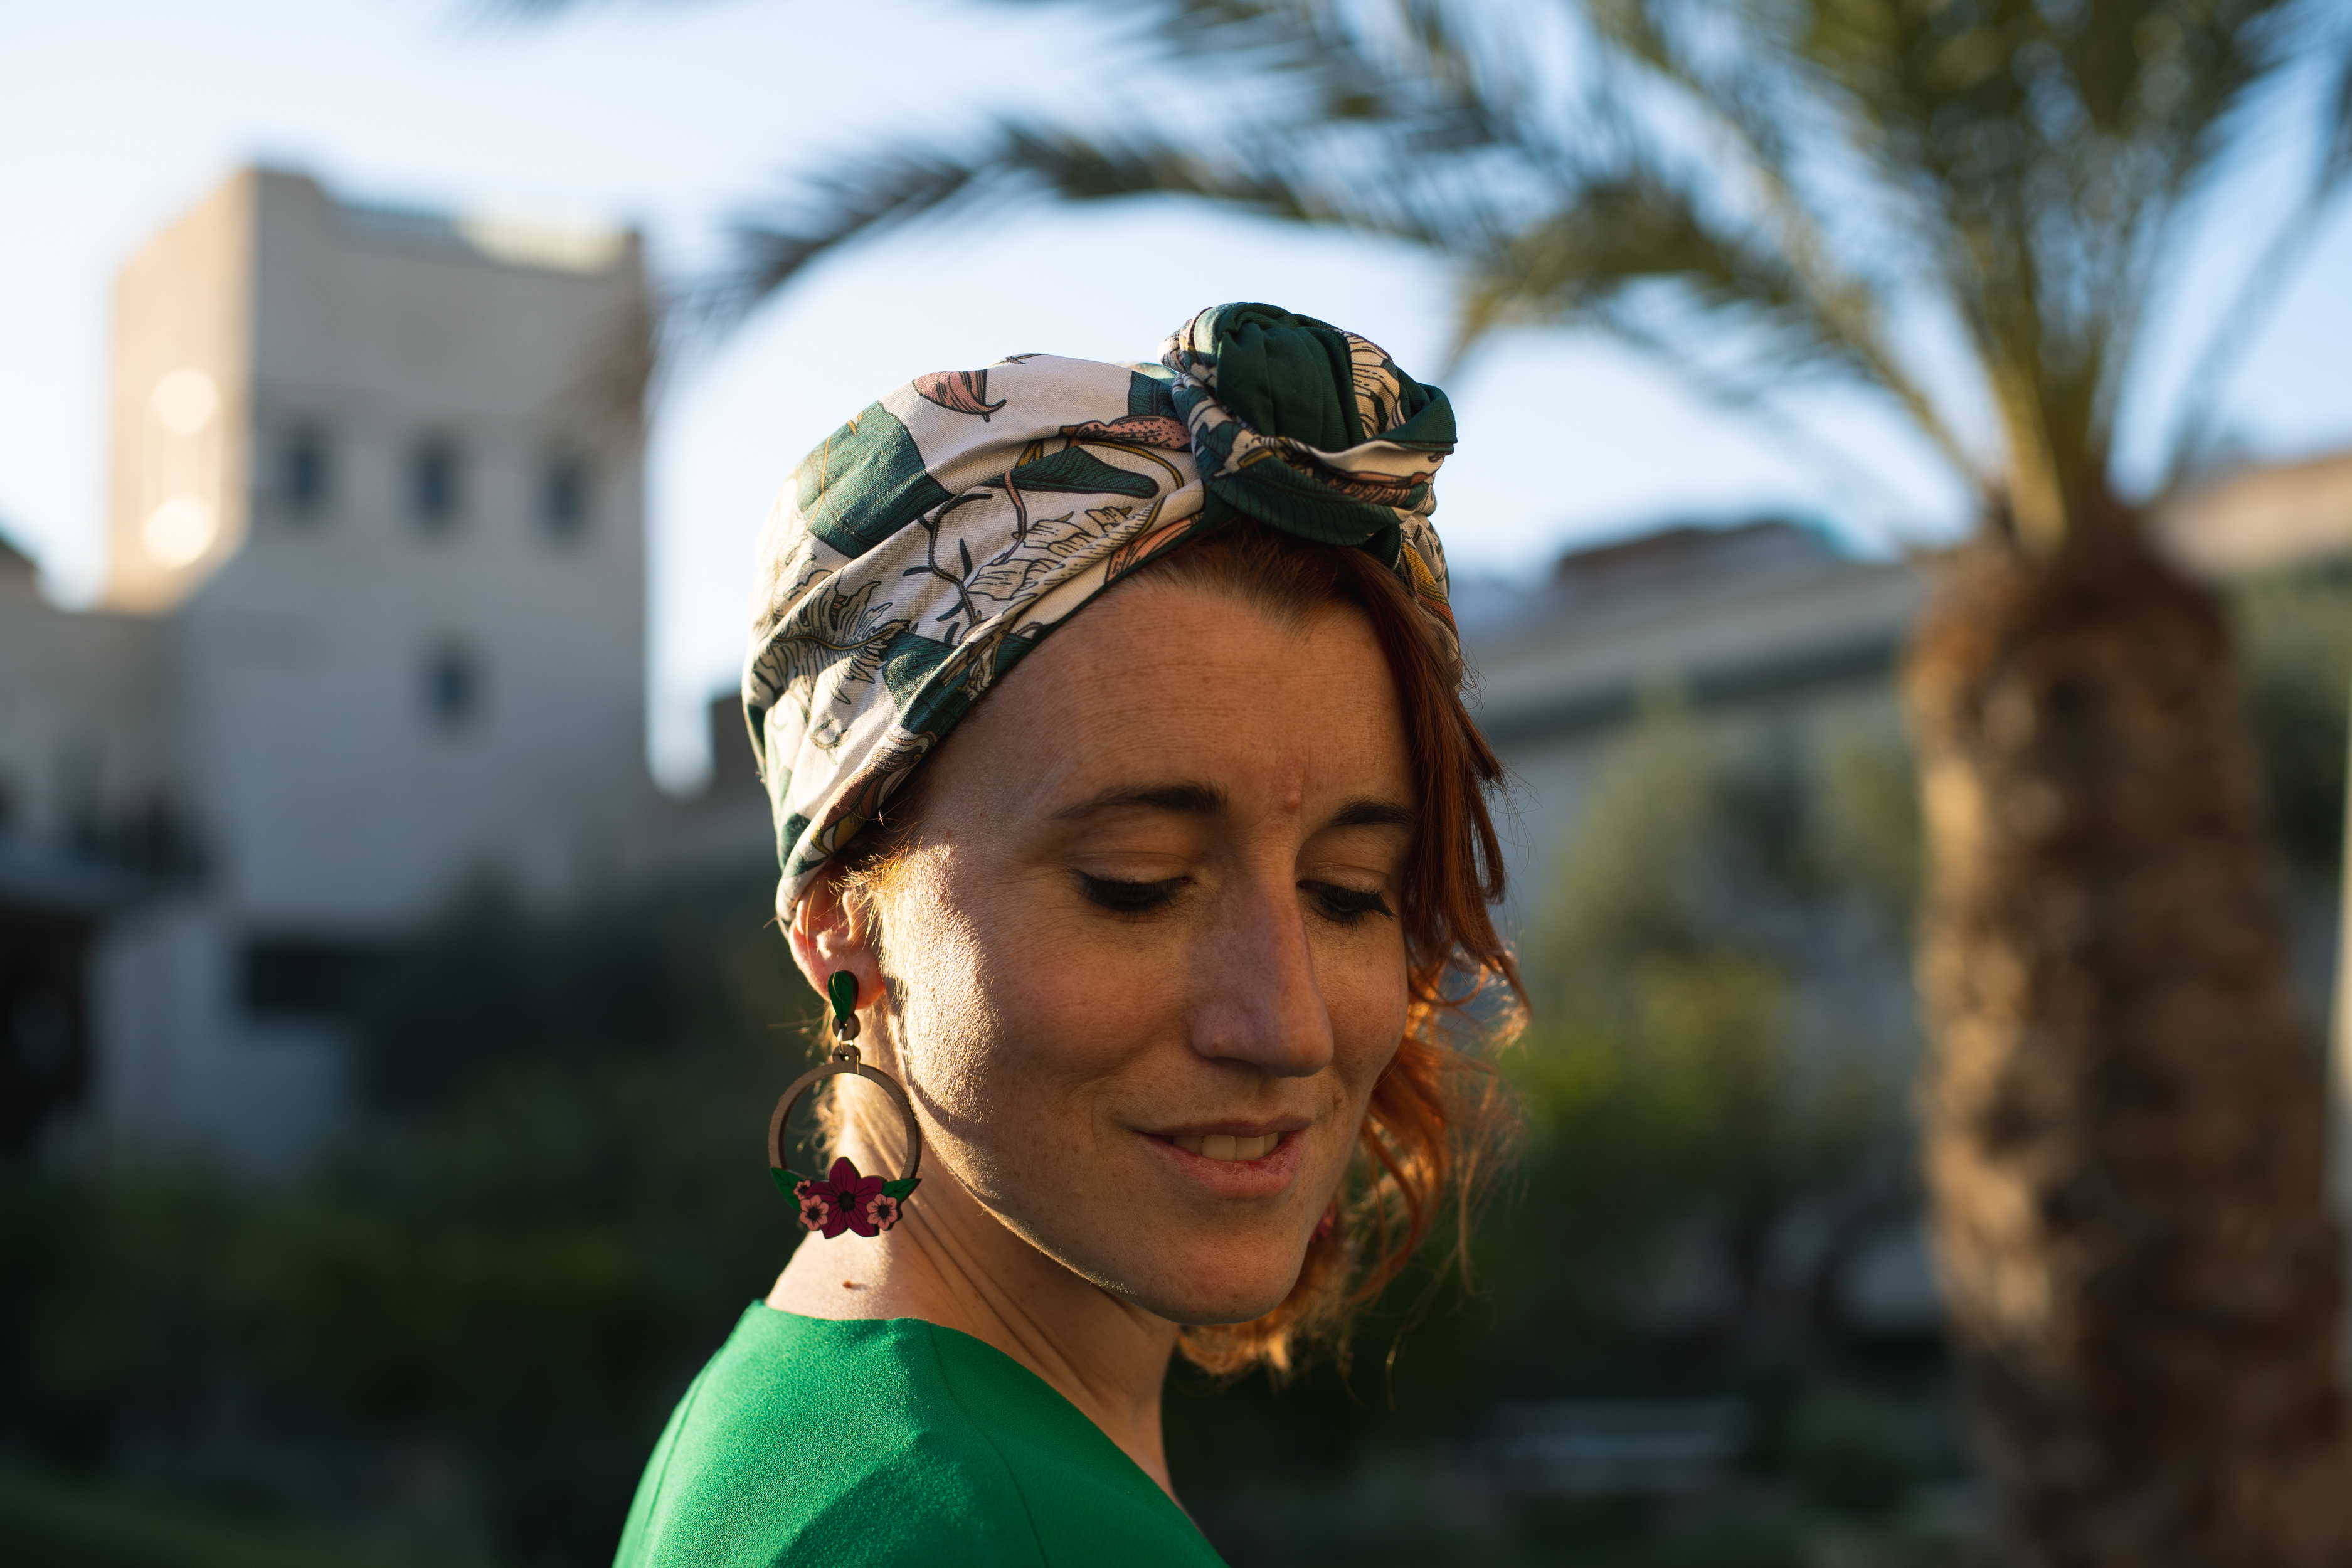 turban-cheveux-mamzel-tutu-lookbook